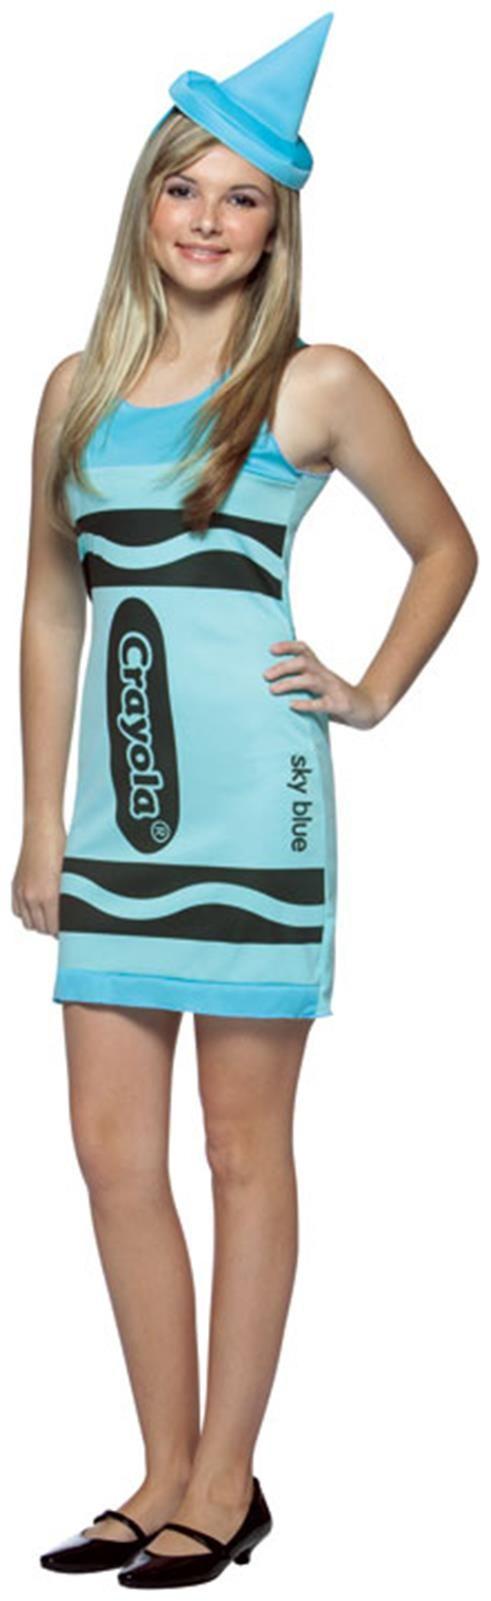 PartyBell.com - Sky Blue Crayola Crayon Teen #Costume